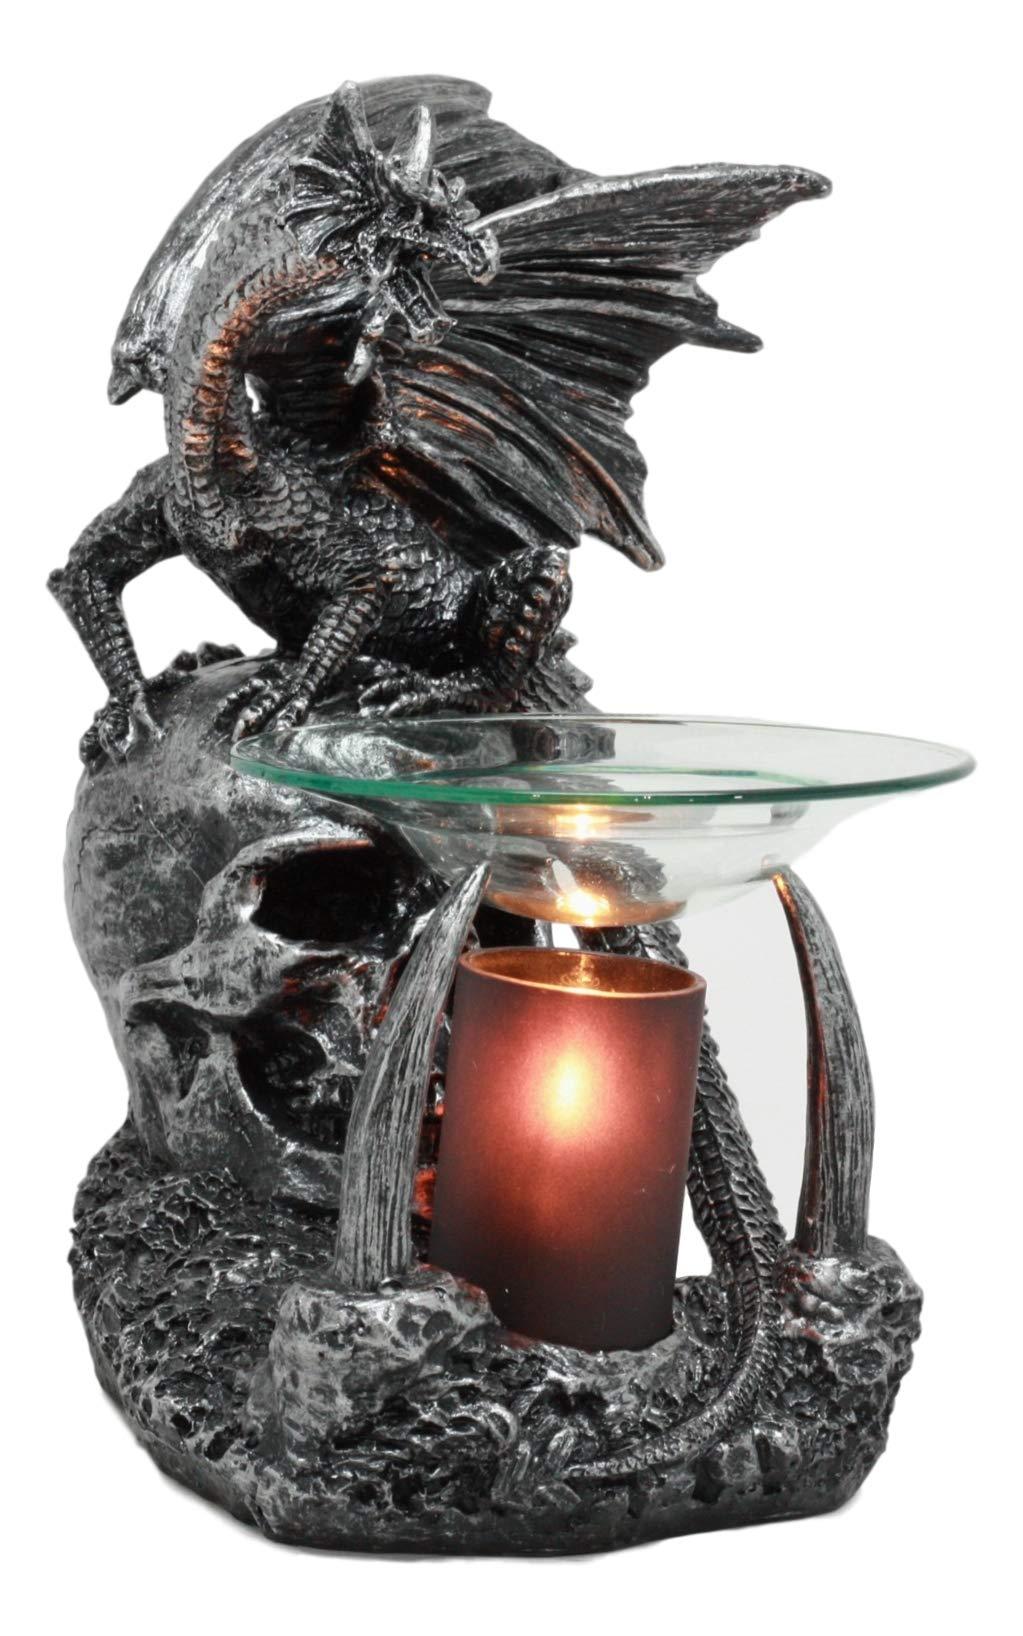 Ebros Gothic Sabretooth Skull Graveyard Dragon Electric Oil Burner Or Tart Warmer Decor Statue 8.5'' Tall Home Fragrance Aroma Accessory Figurine